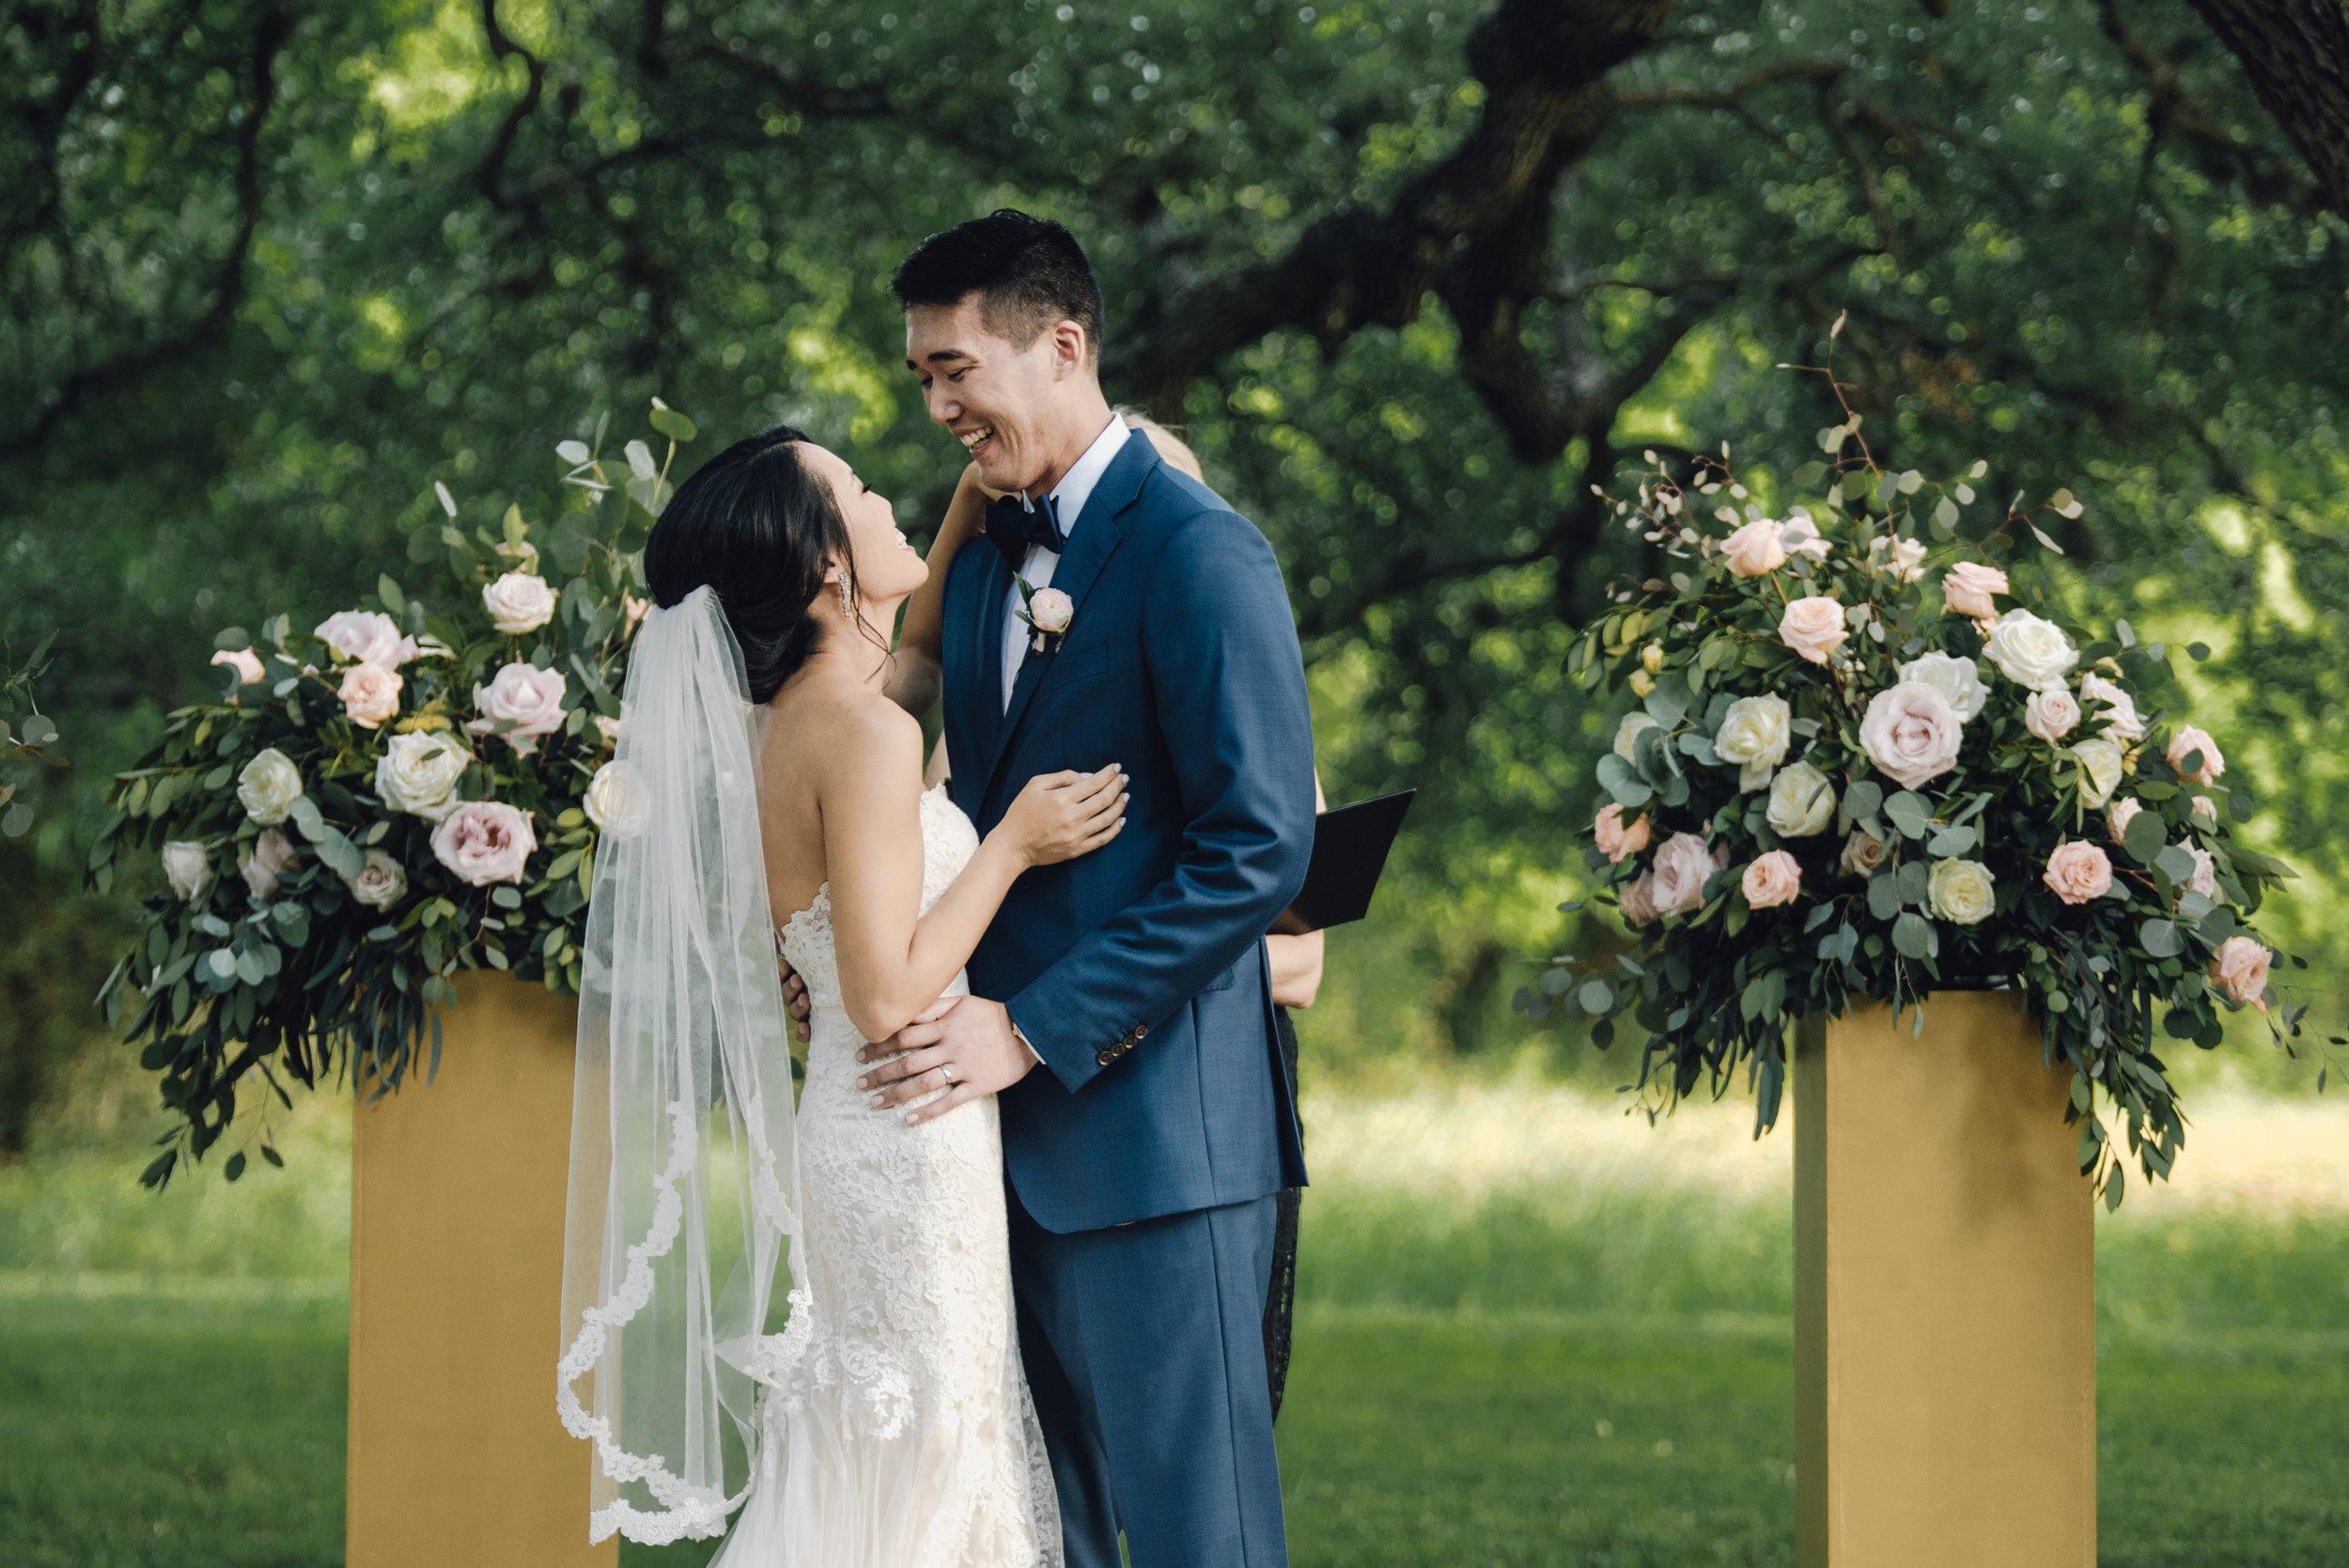 Main and Simple Photography_2018_Weddings_Austin_B+E-1273.jpg